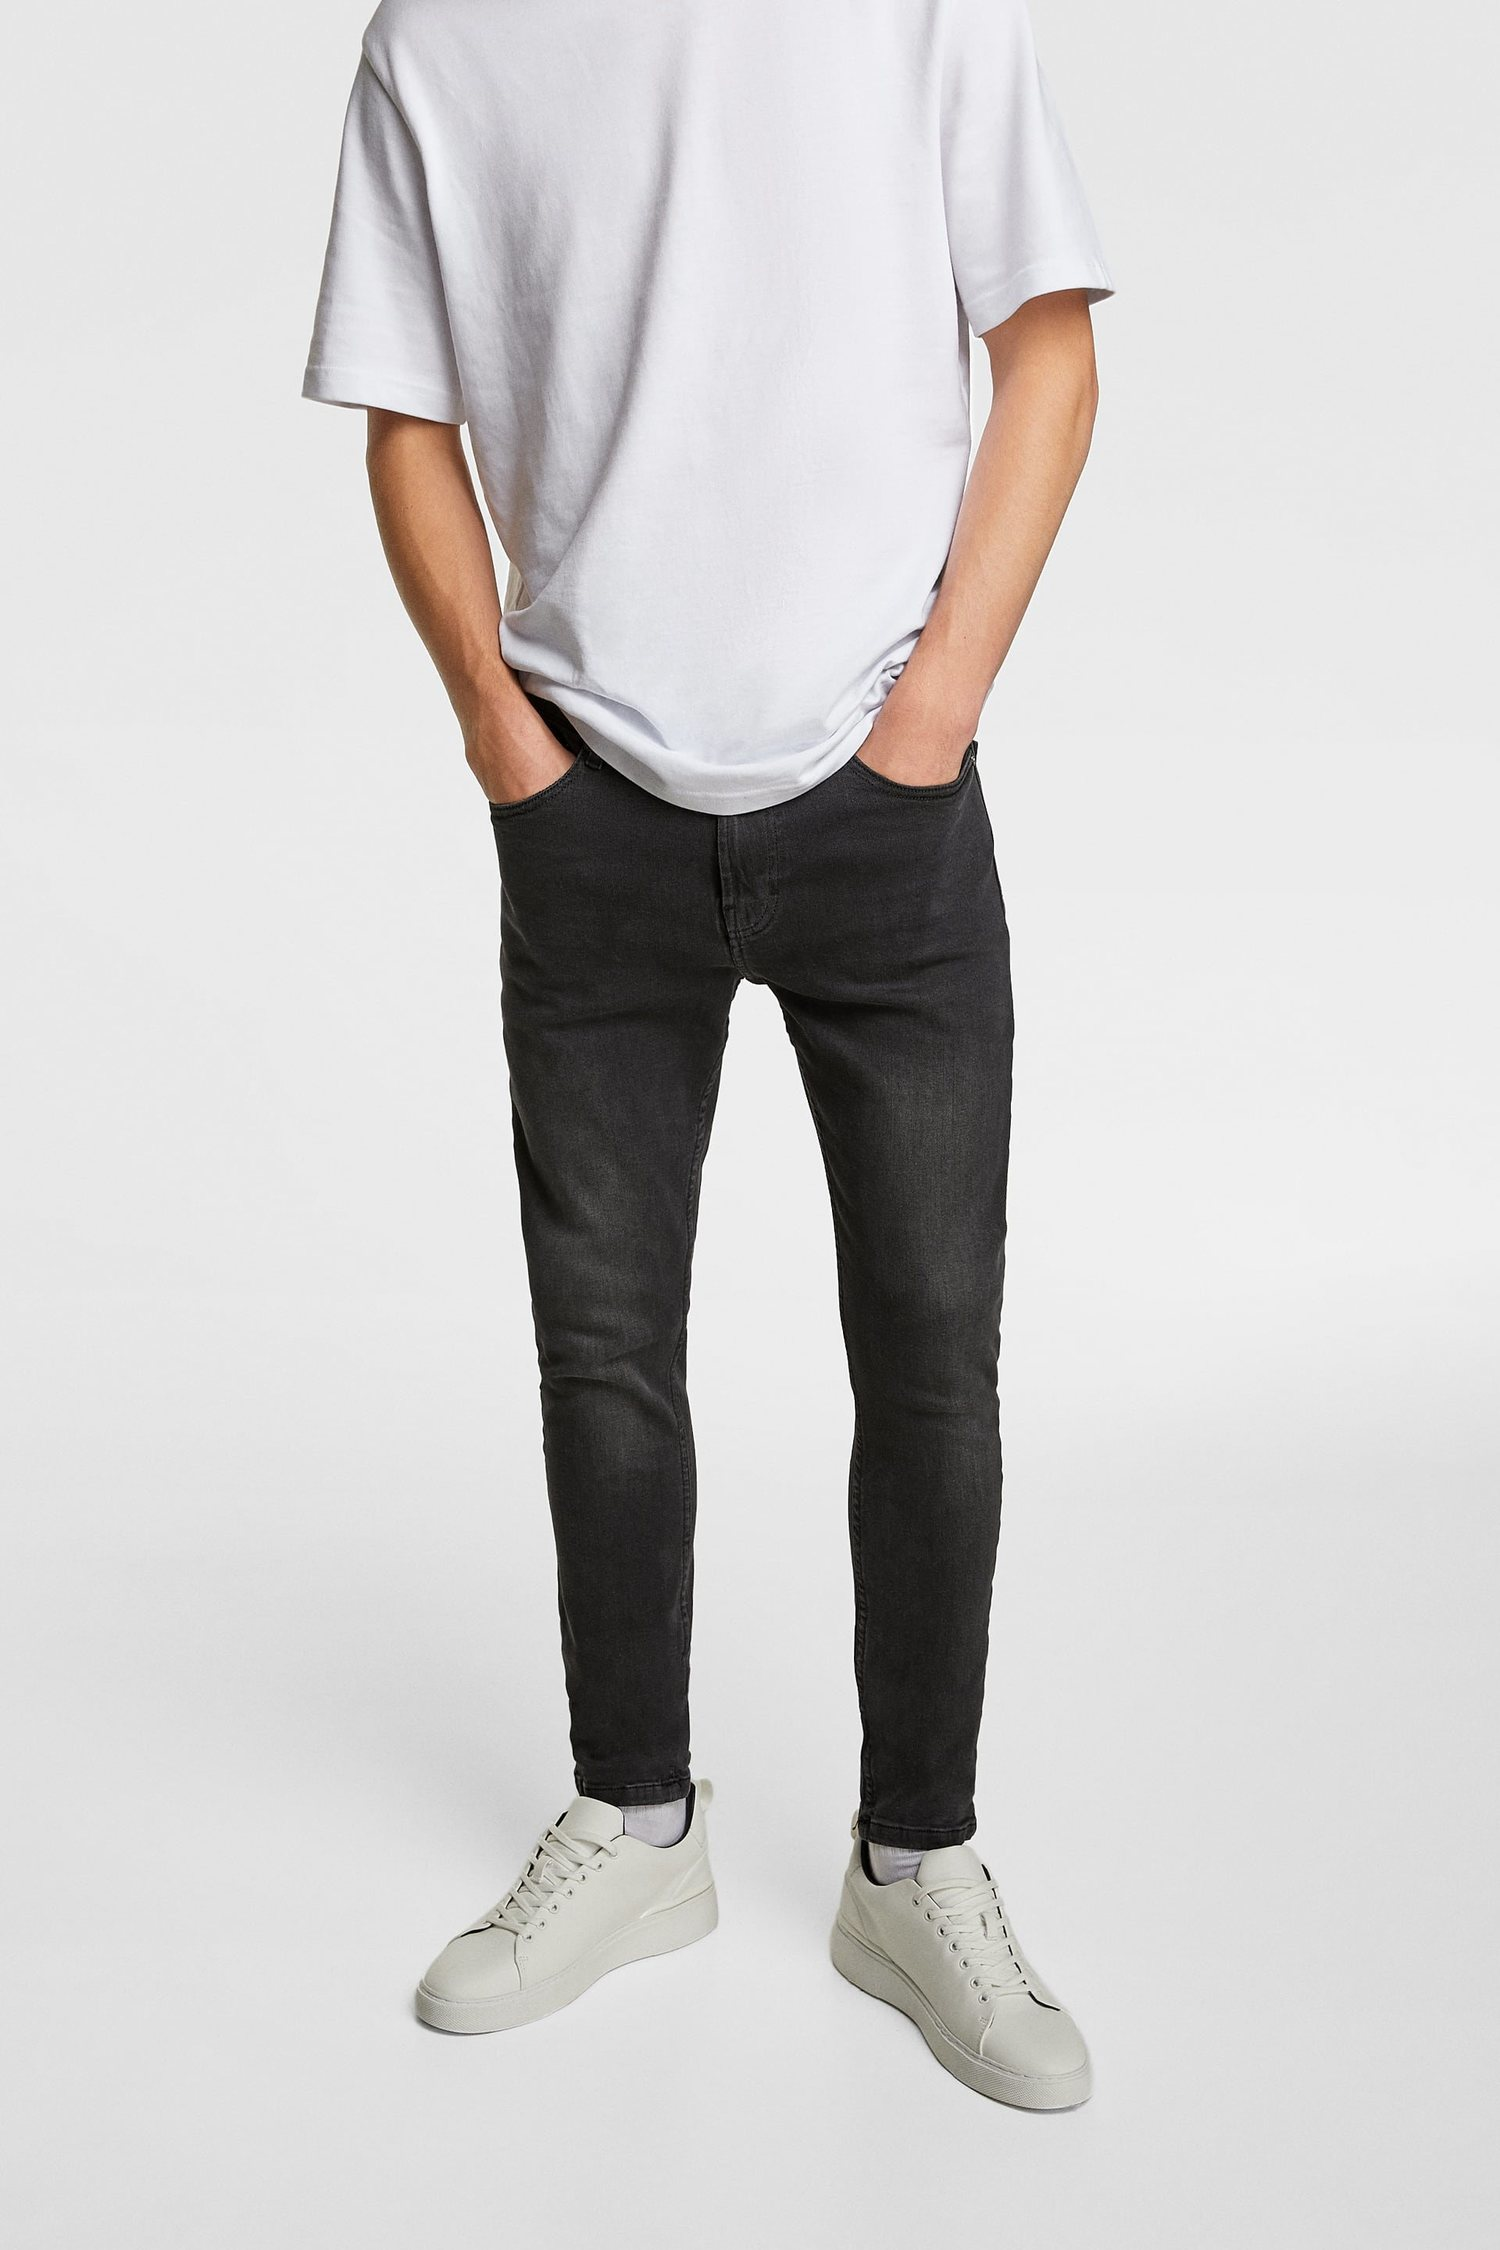 Jeans Zara.